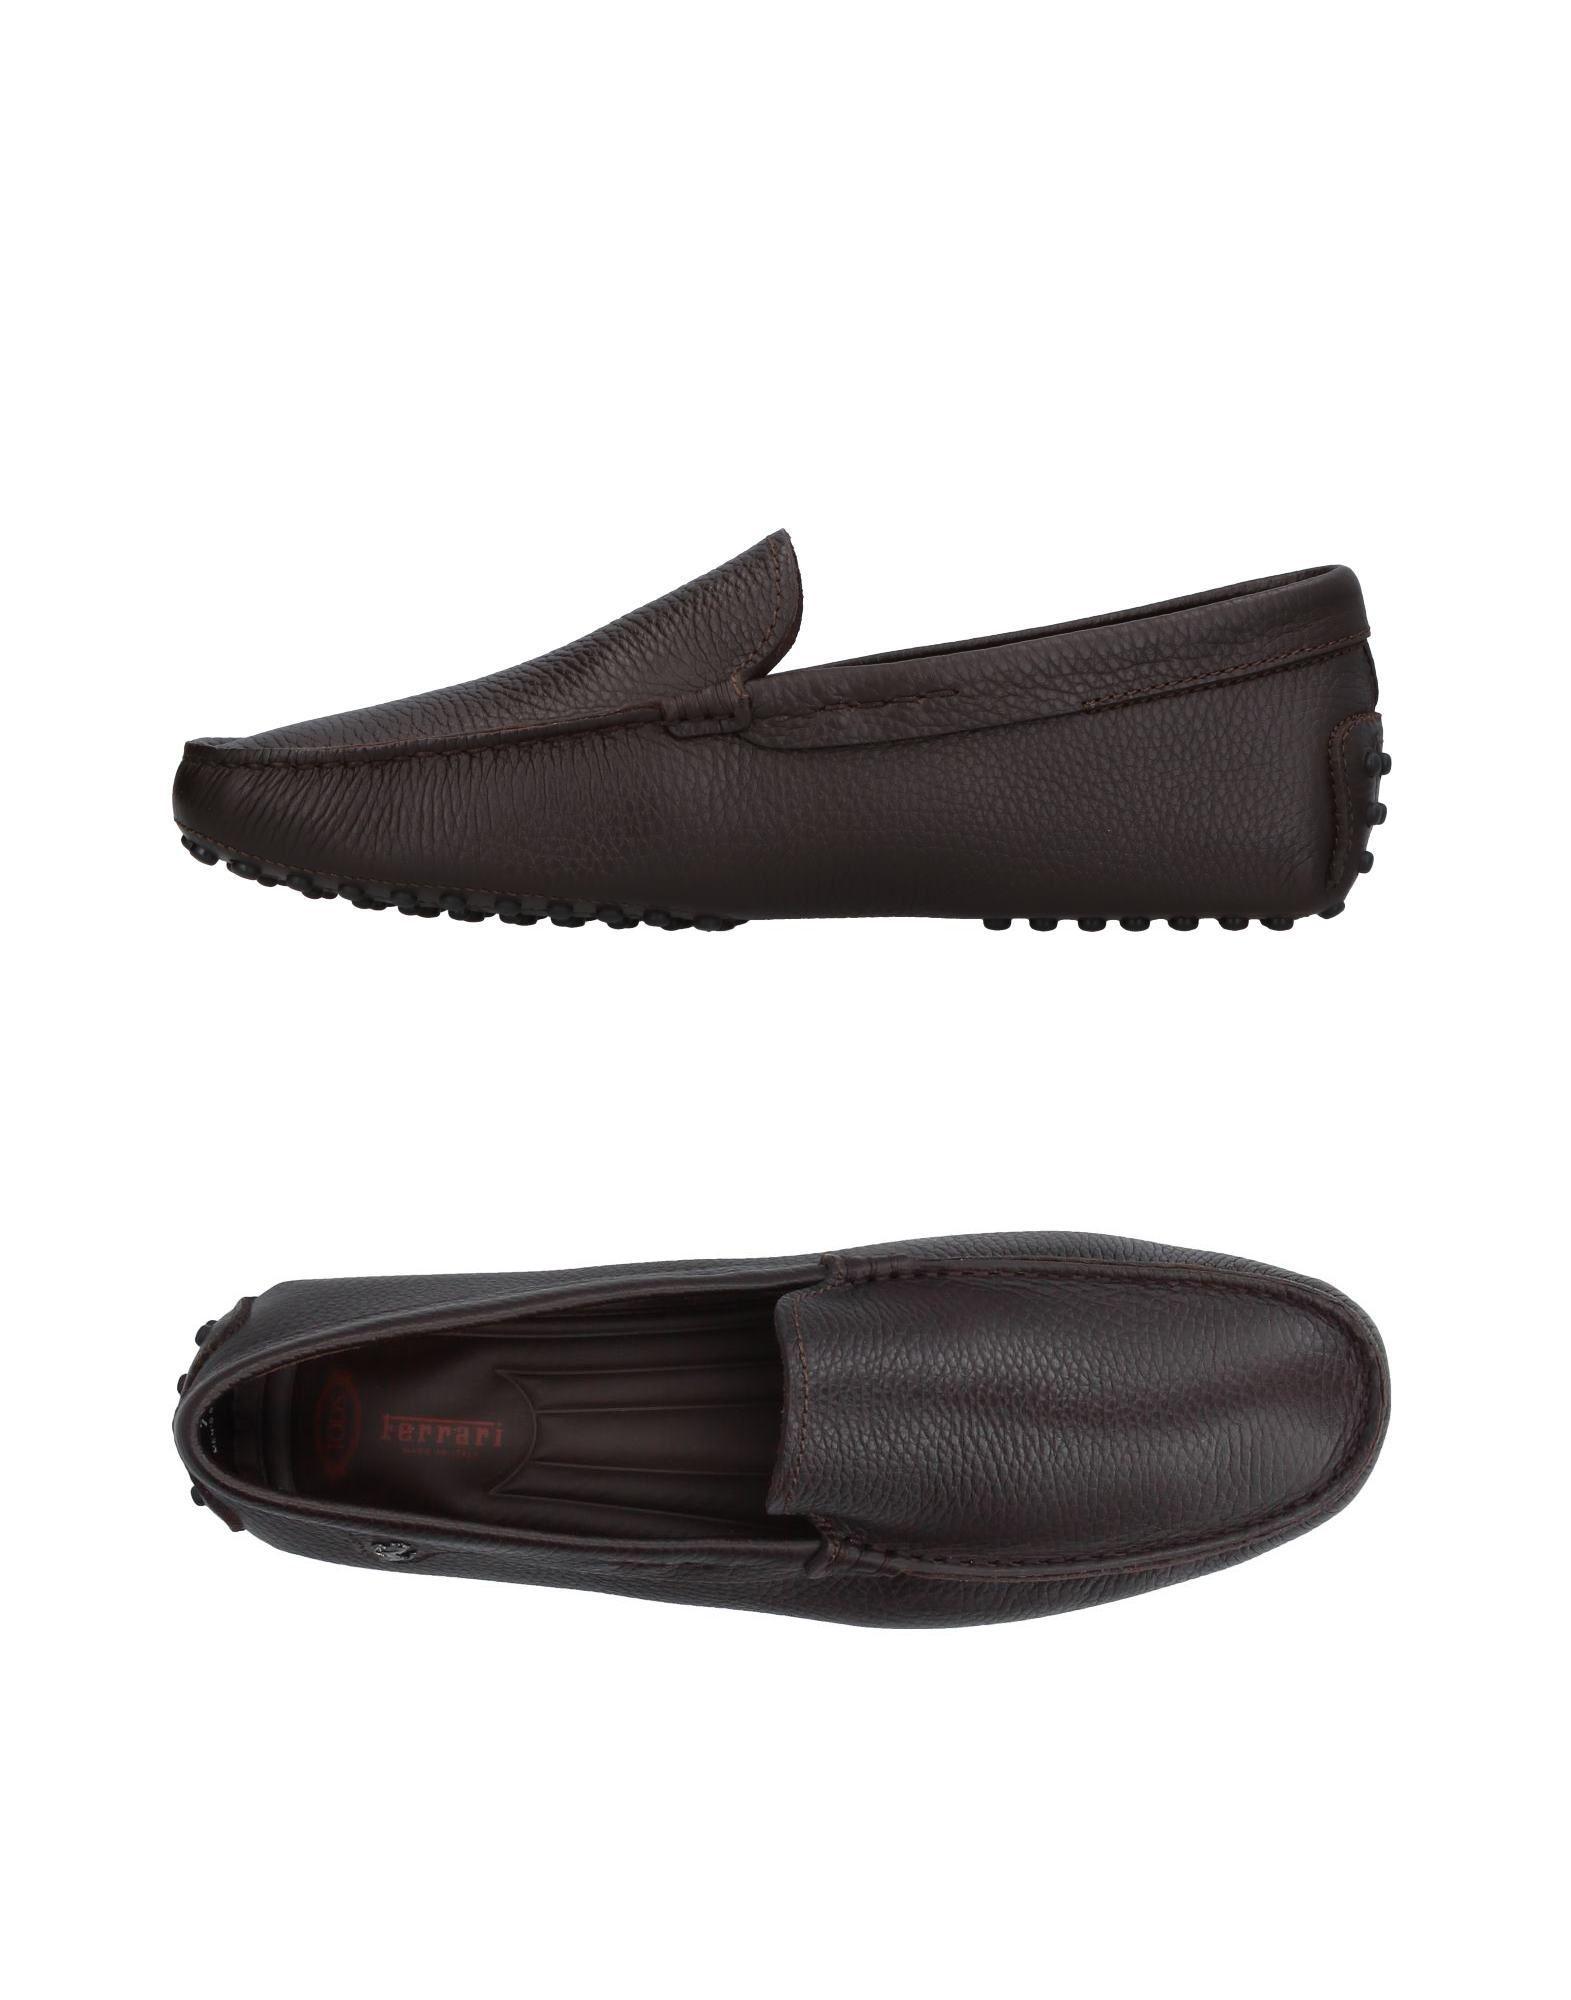 Tod's For Ferrari Mokassins Herren  11398866IJ Gute Qualität beliebte Schuhe